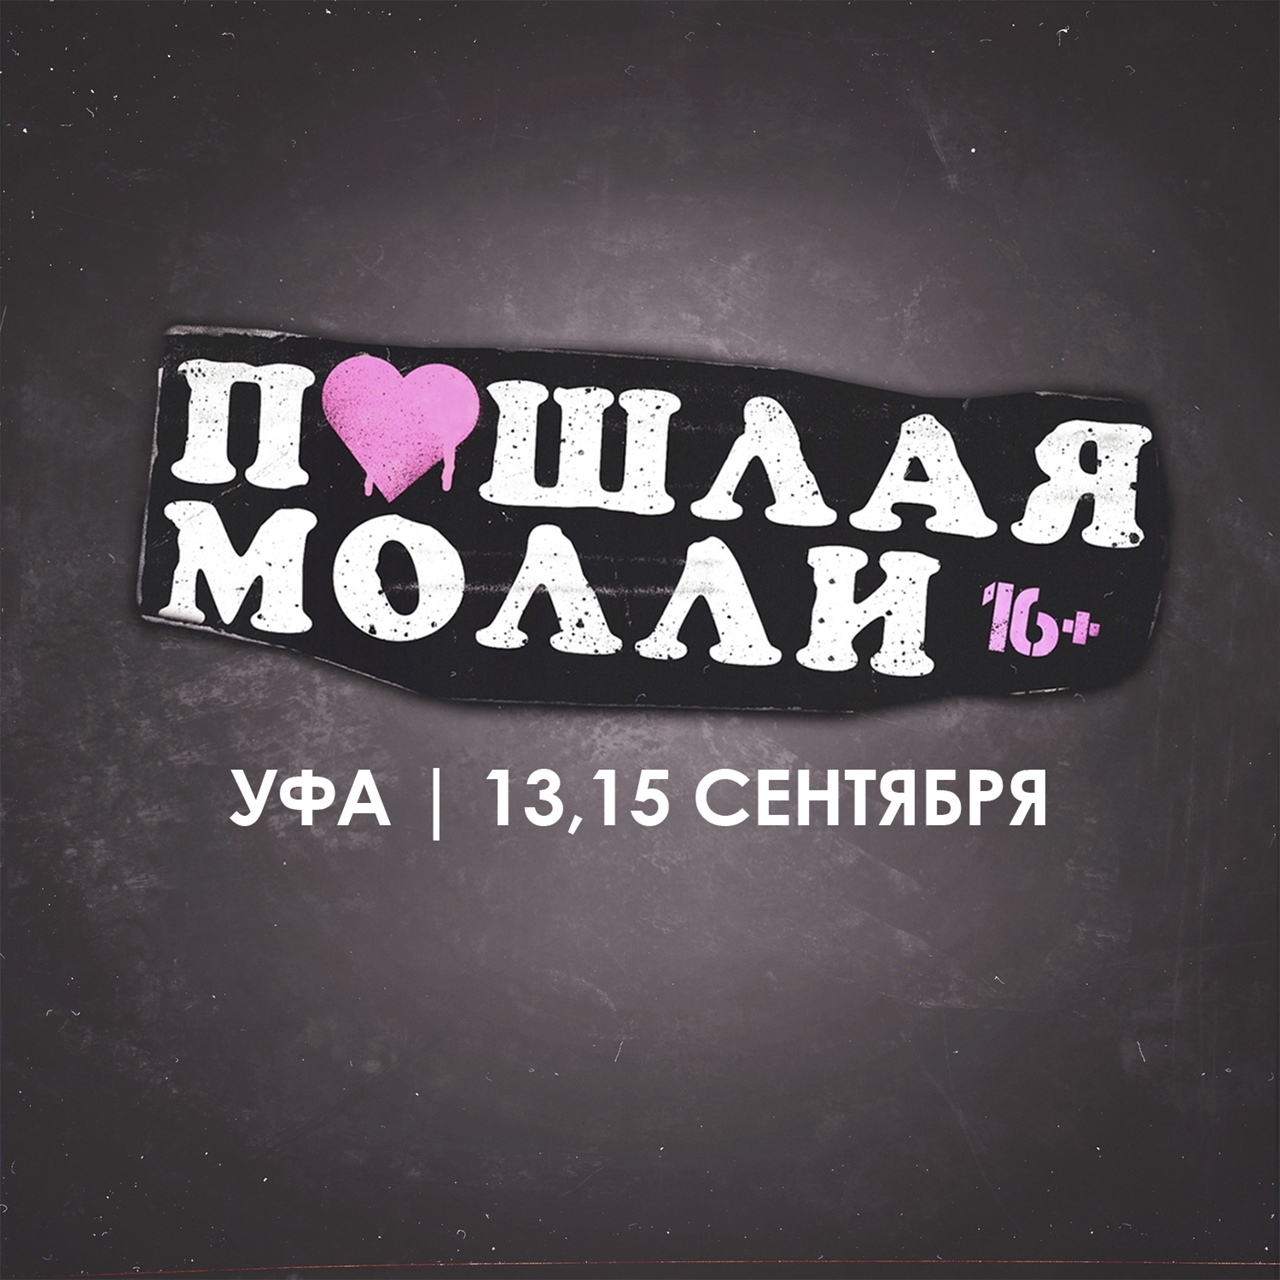 Афиша Уфа ПОШЛАЯ МОЛЛИ - УФА /8,9 ДЕКАБРЯ Tinkoff Hall